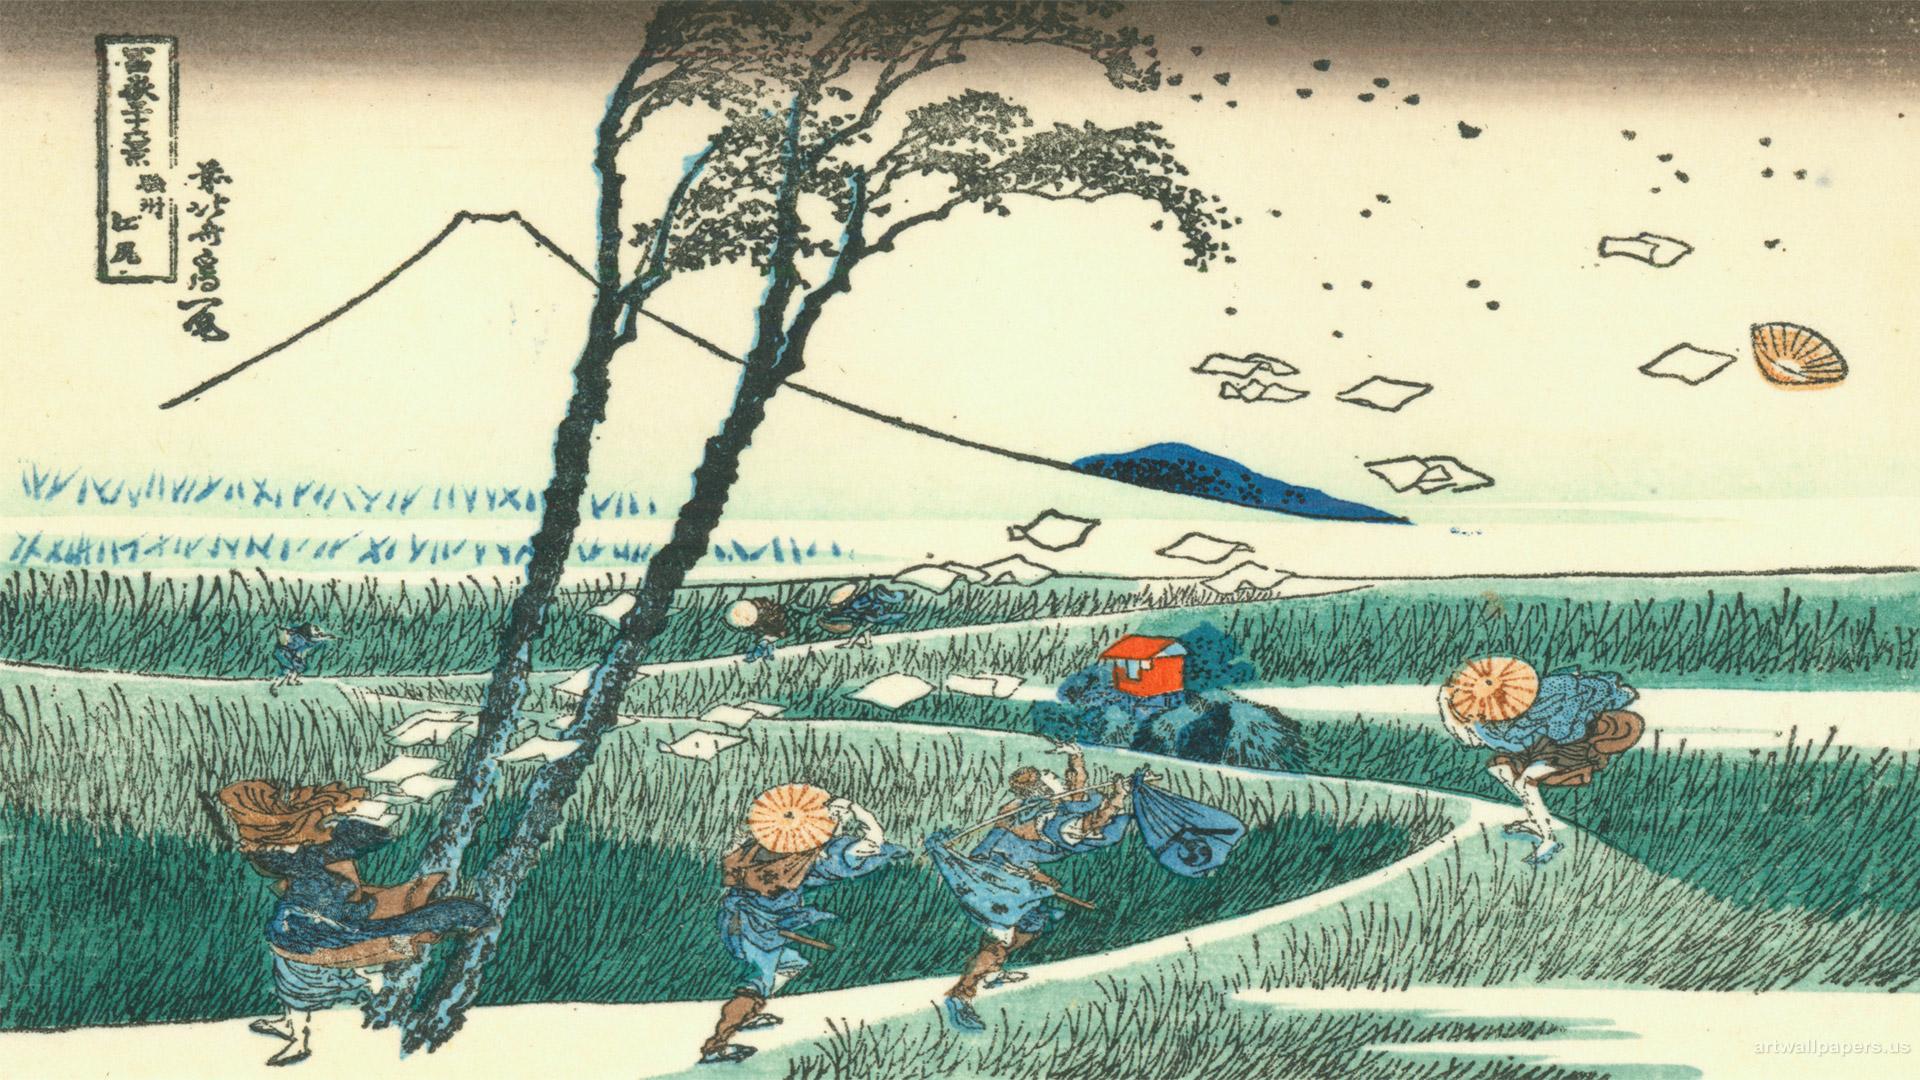 Madarame Bald The Great Wave Off Kanagawa Wallpaper Allwallpaper